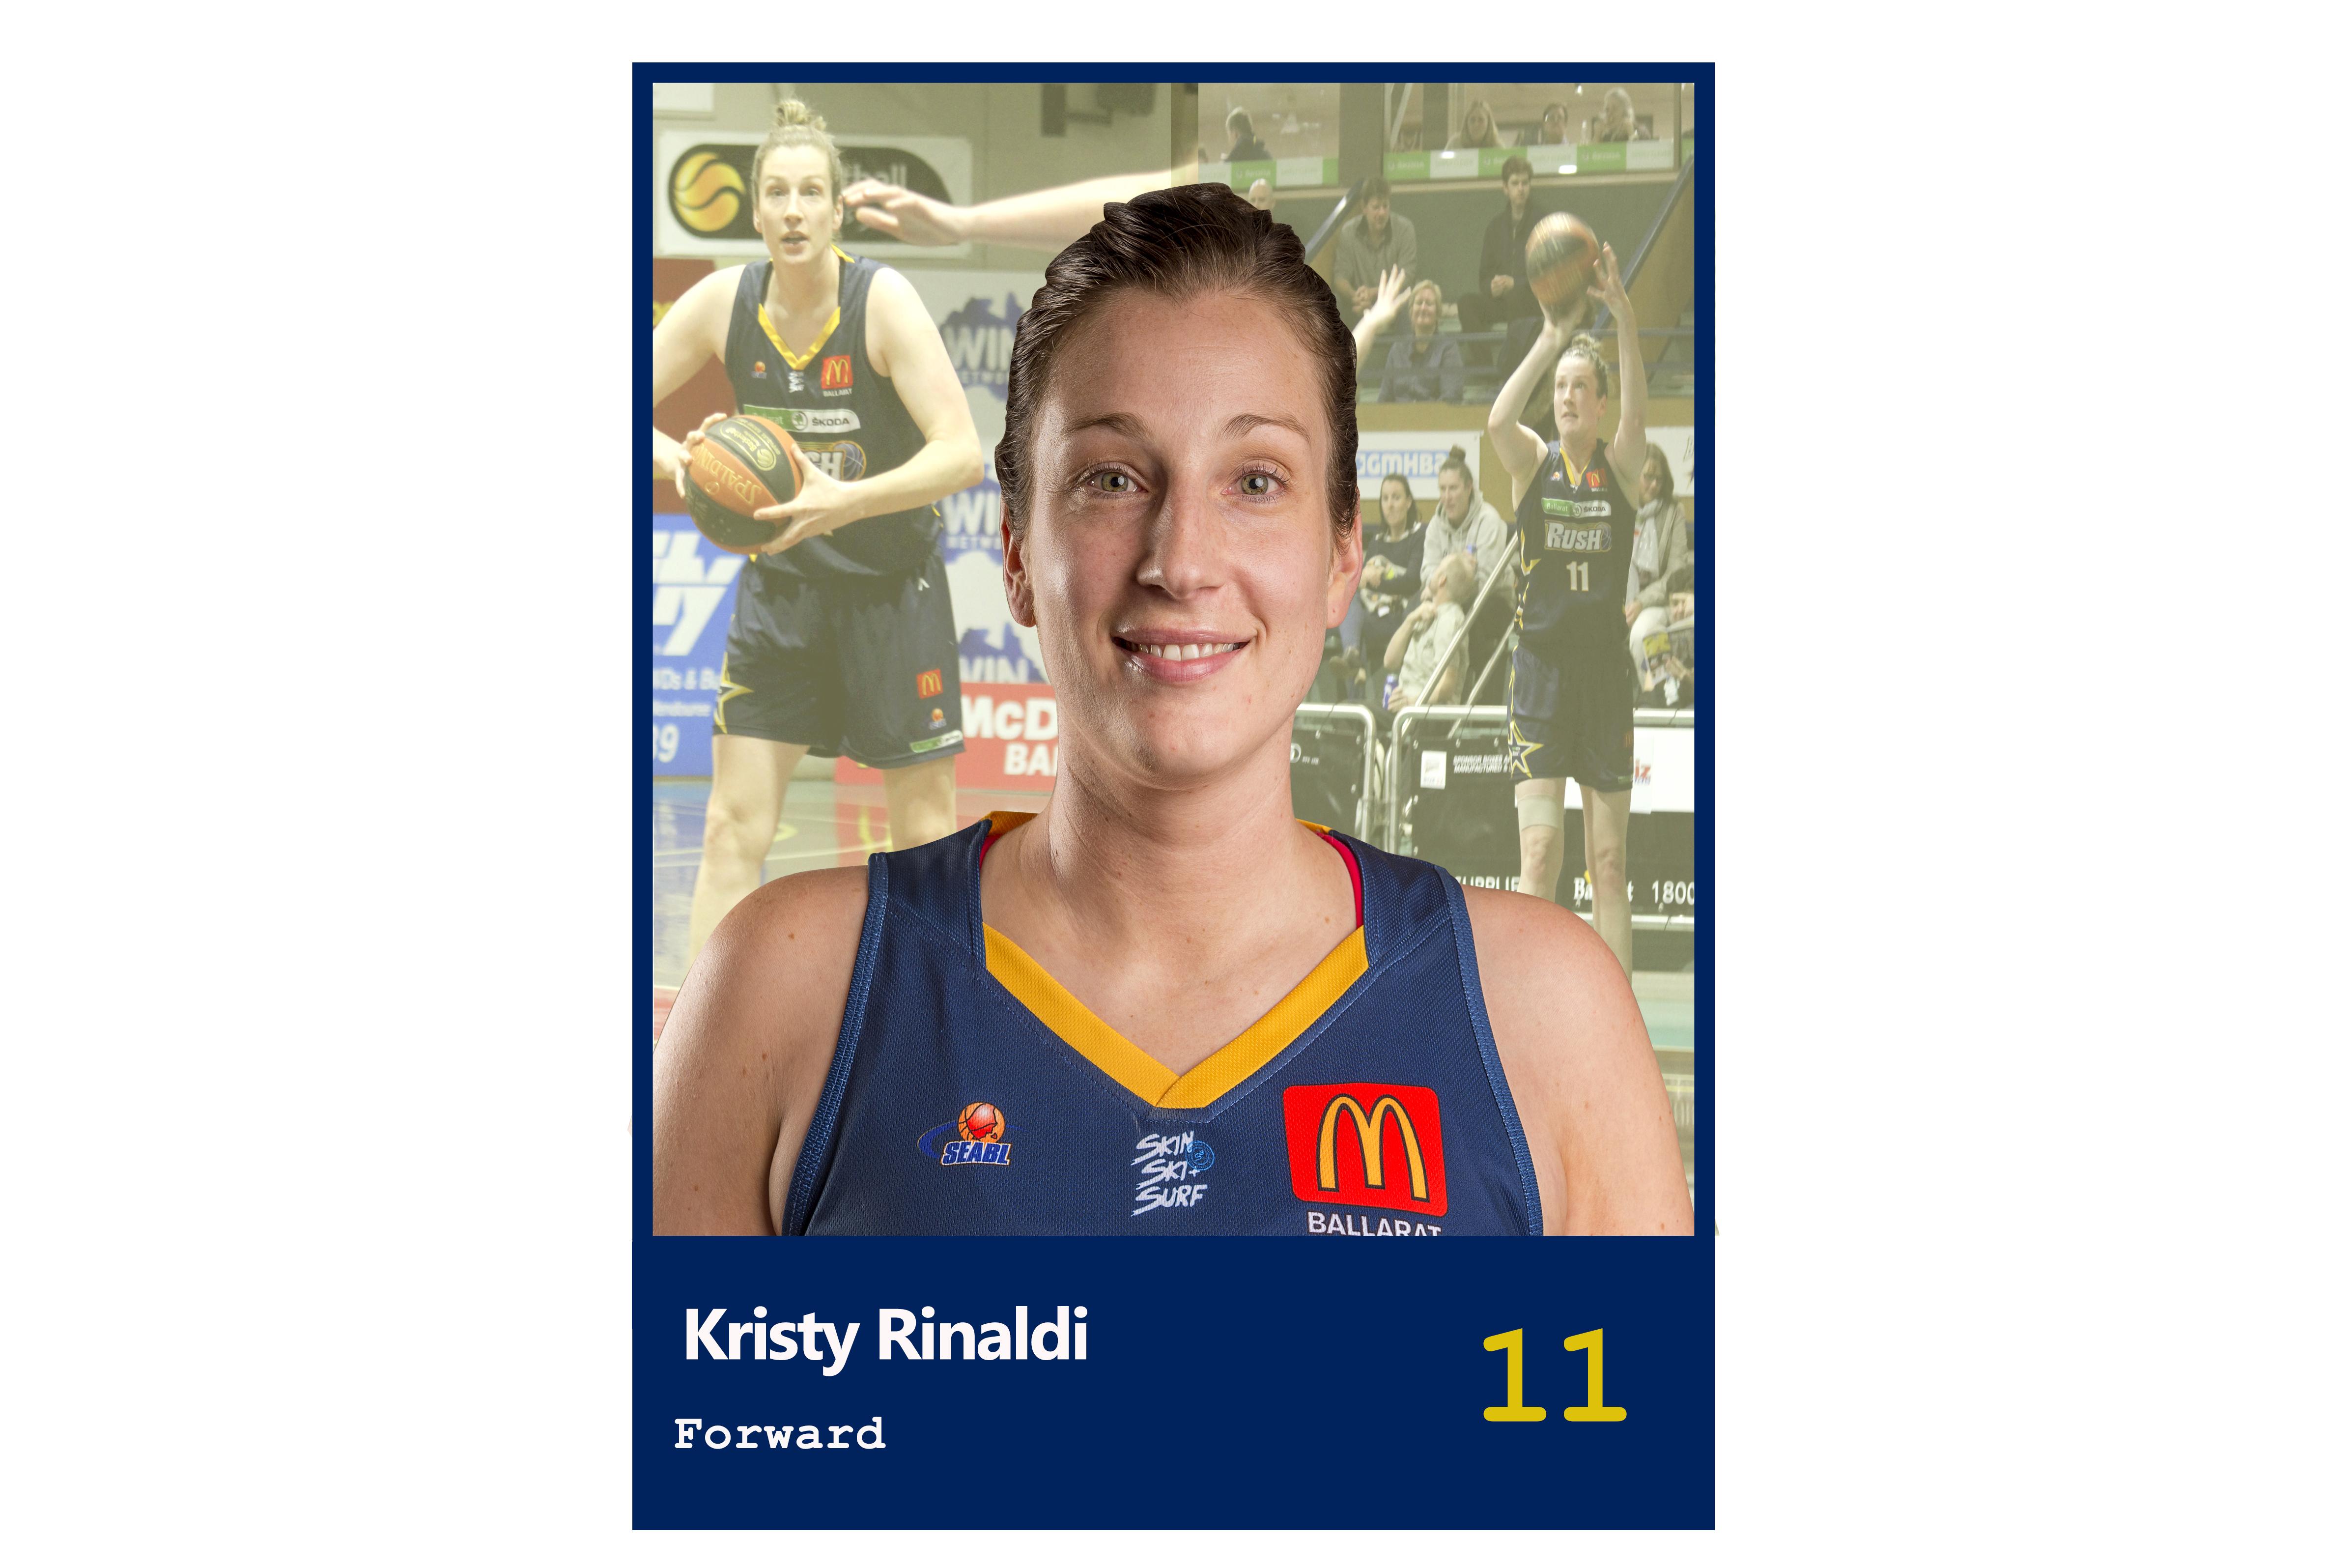 Kristy Rinaldi